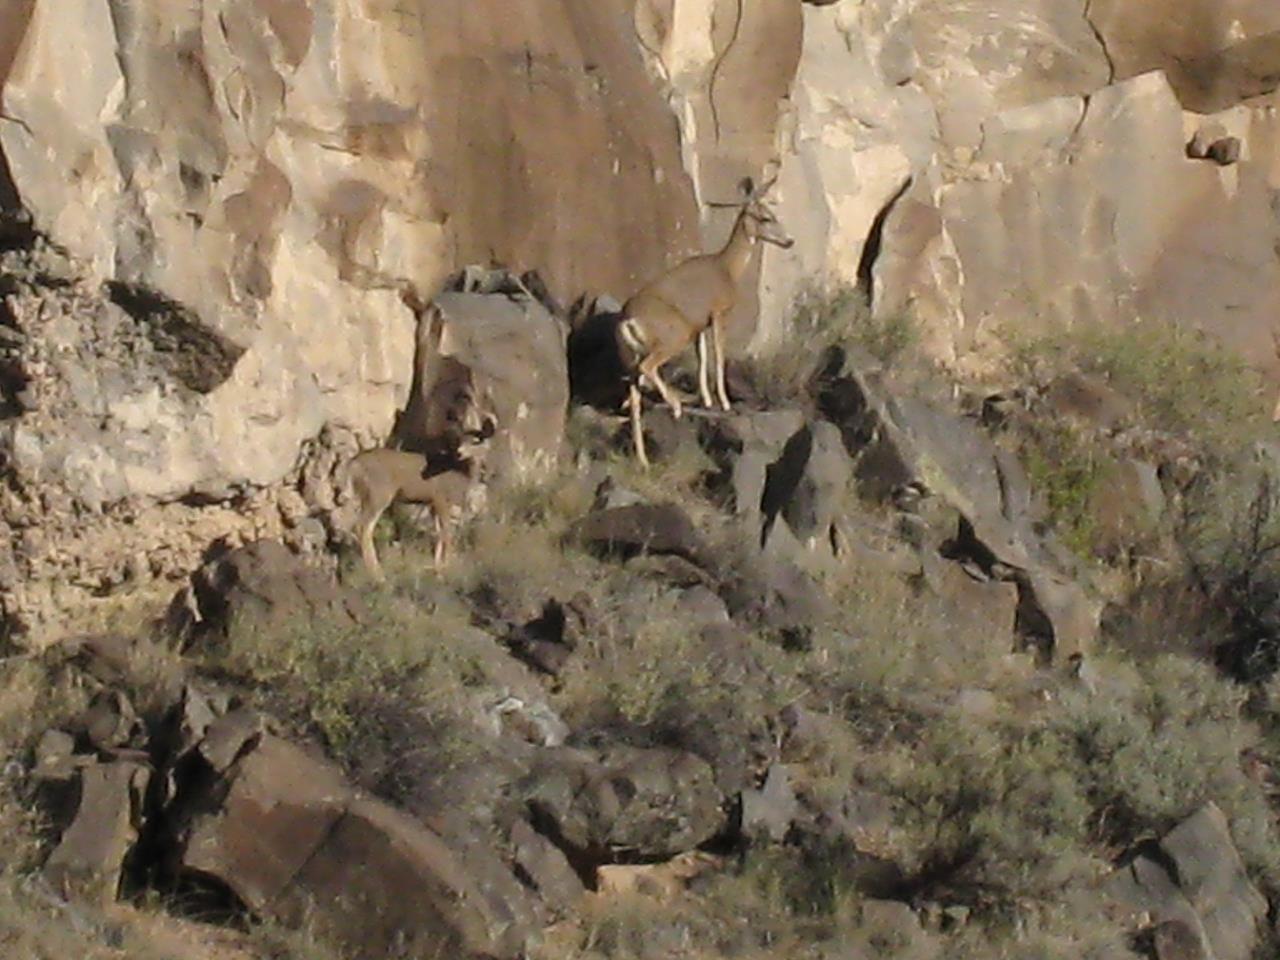 #Taos recreation #wildlife #mule deer #Rio Grande Gorge #Taos #New Mexico